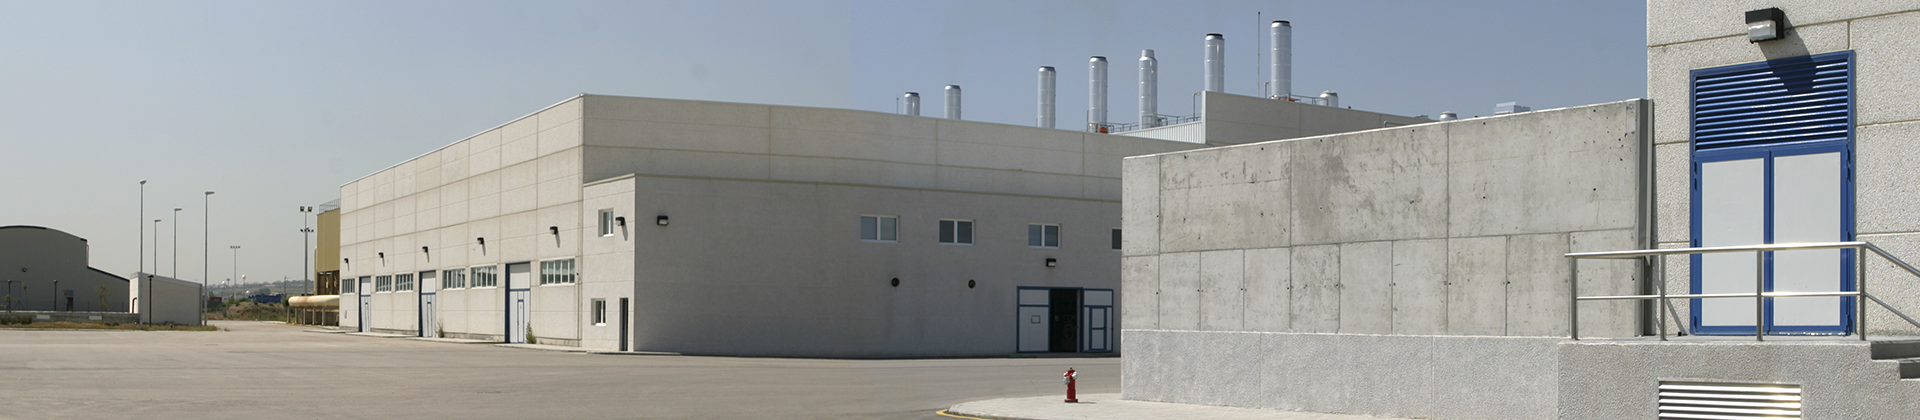 Madrid Barajas Airport - CHP Power Plant